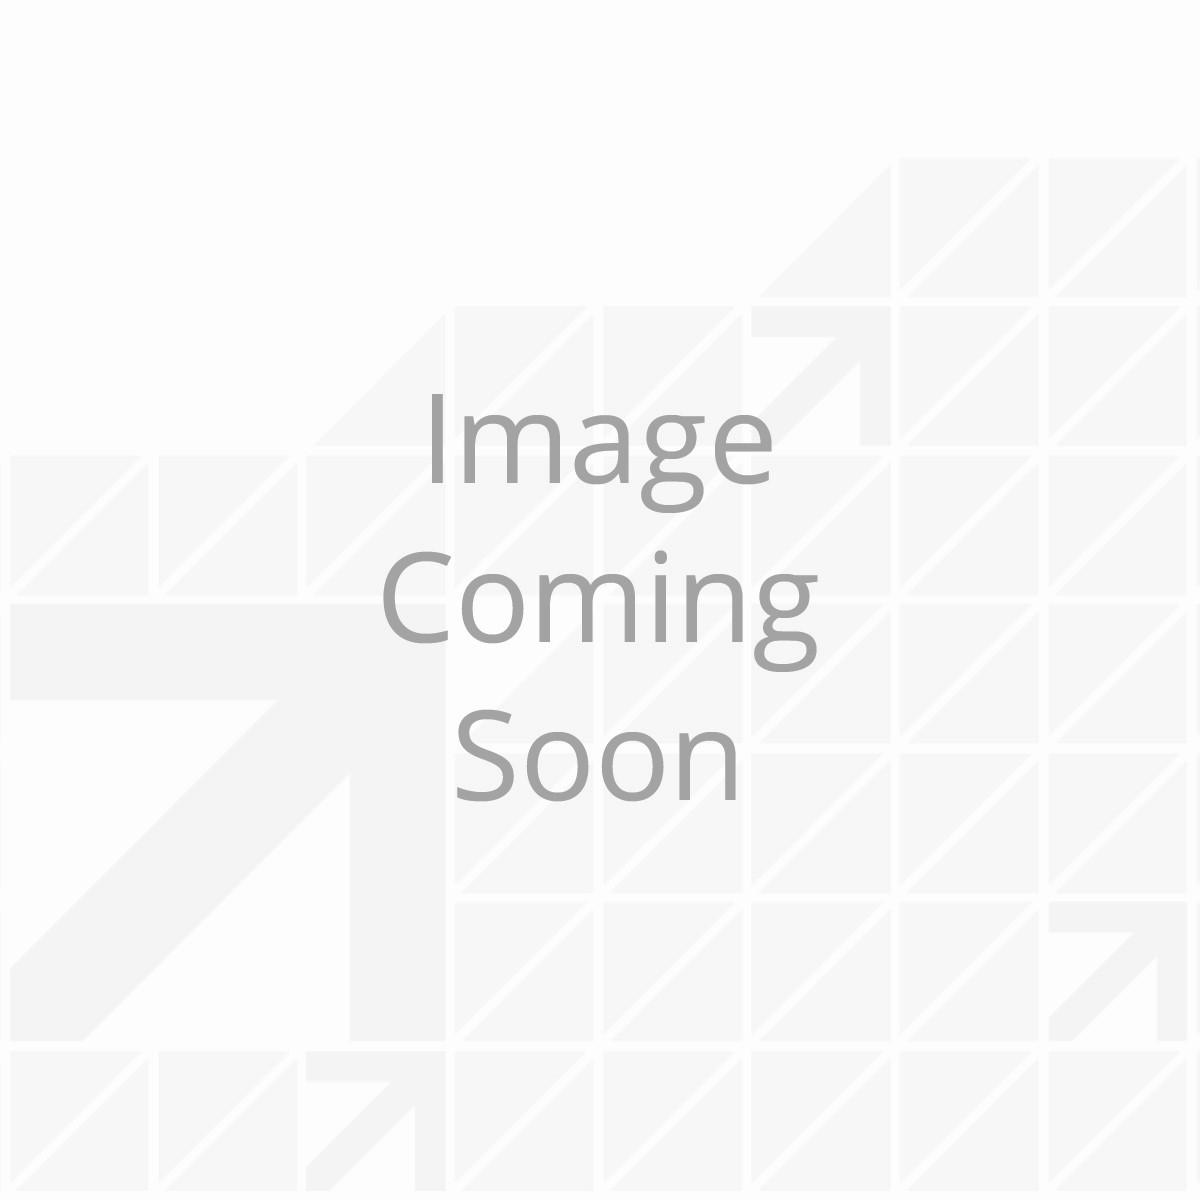 10' Awnbrella™ Fabric Support Kit - 2 Bows